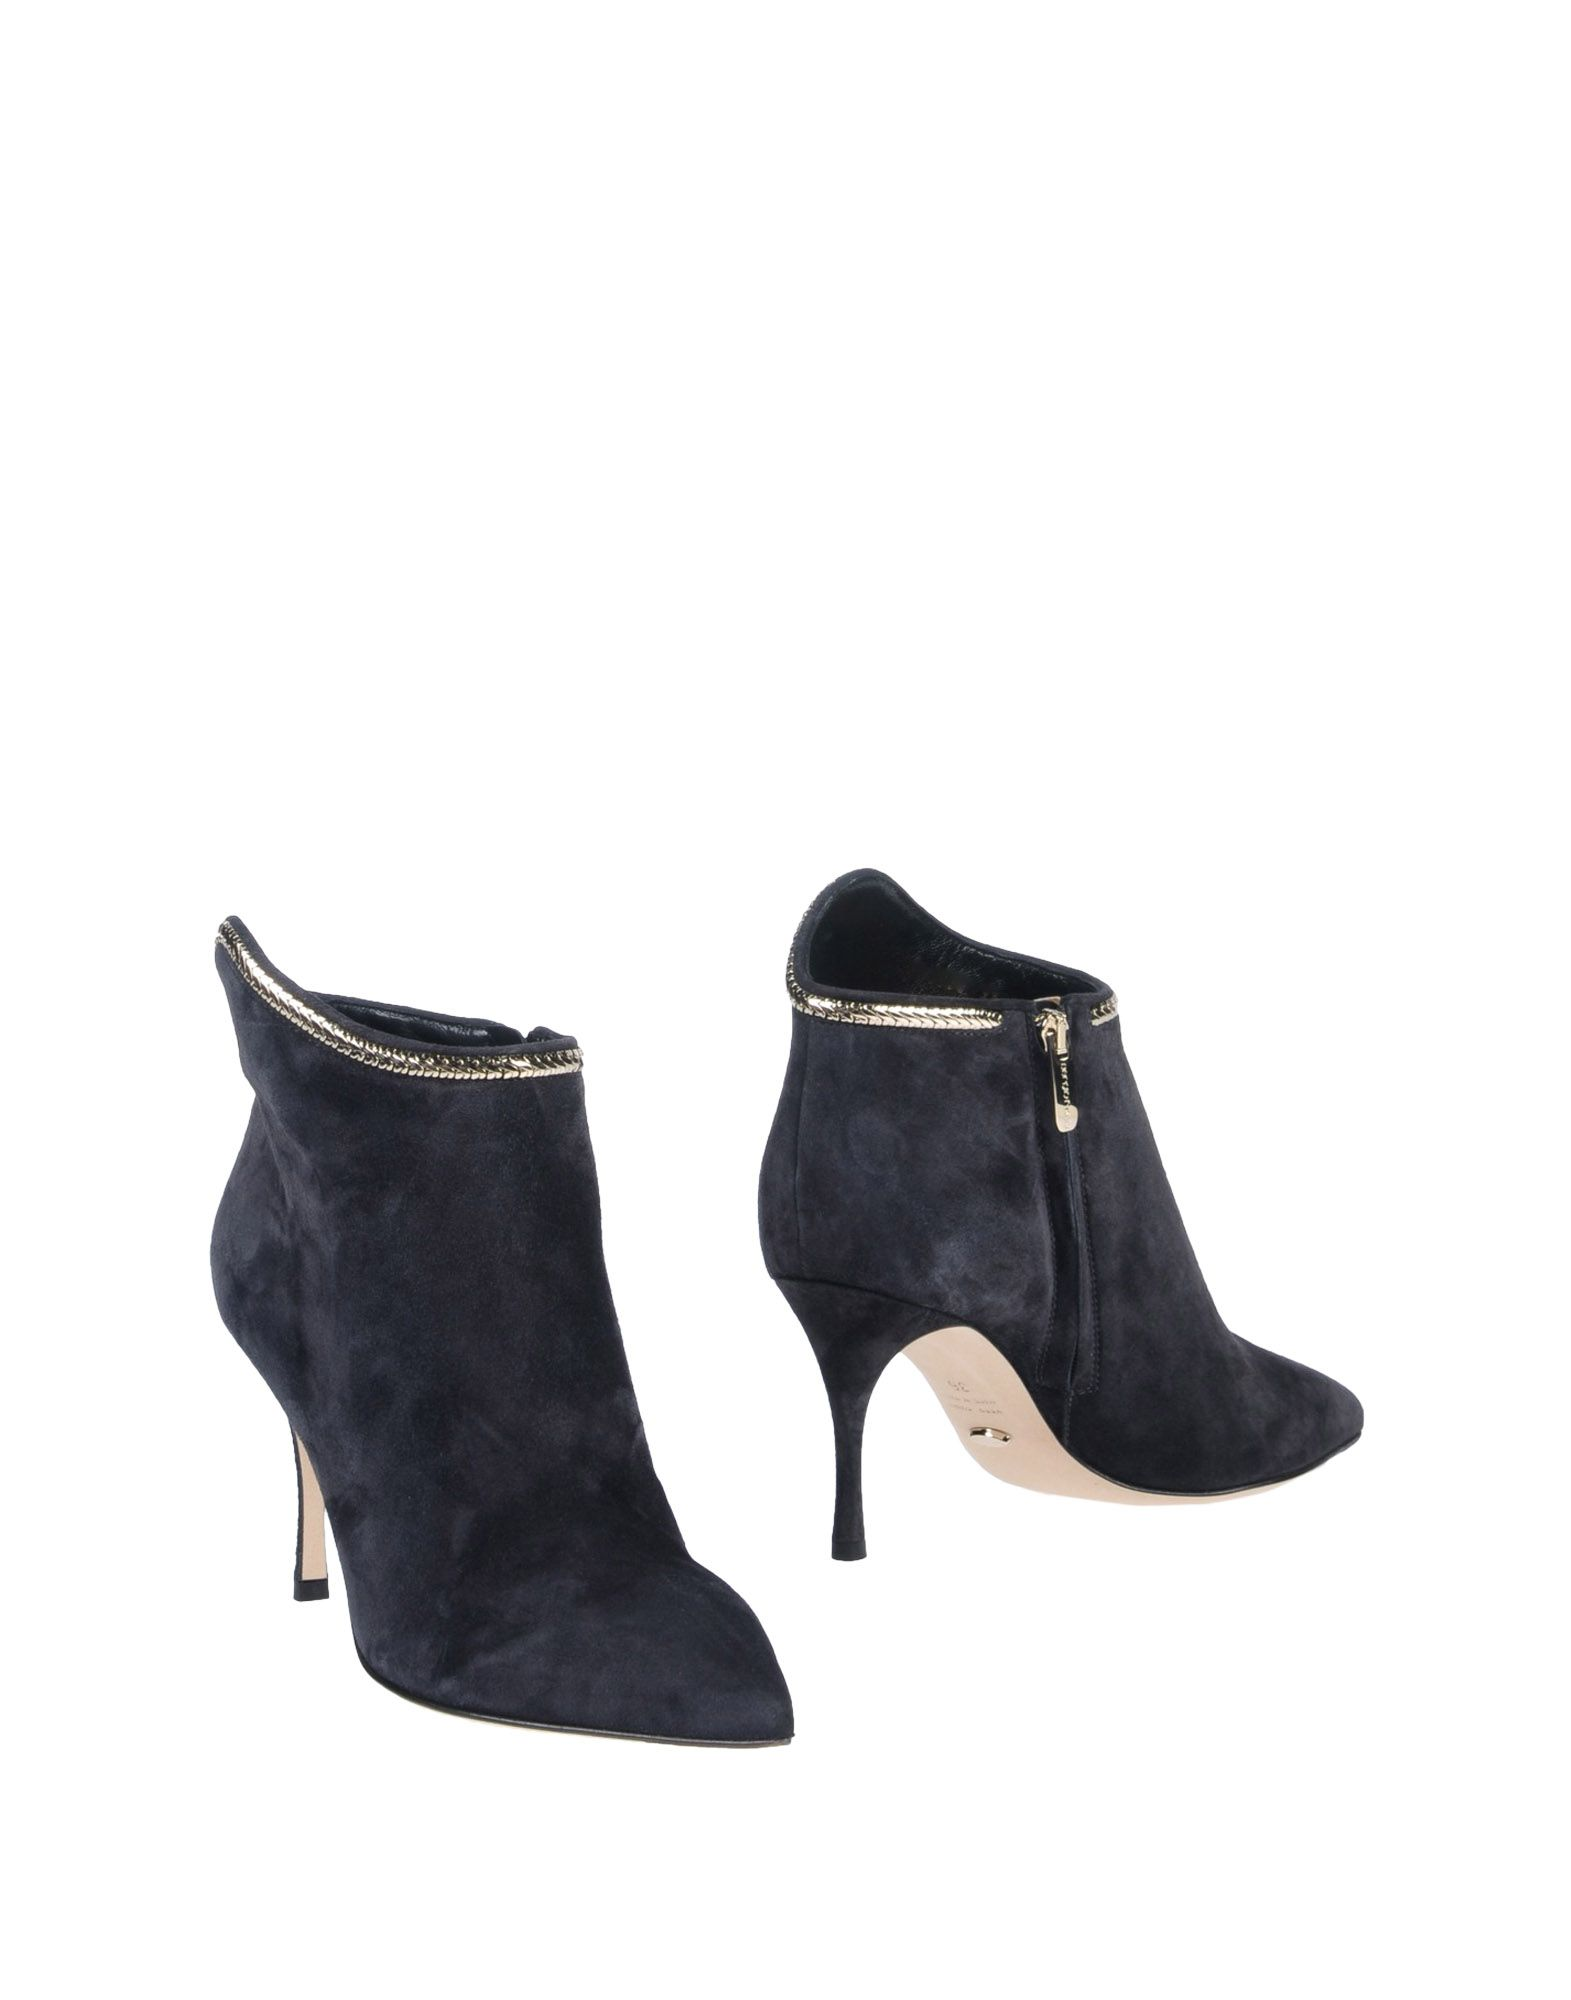 Sergio Rossi Stiefelette Stiefelette Rossi Damen  11412015LW Neue Schuhe 4d0cf9